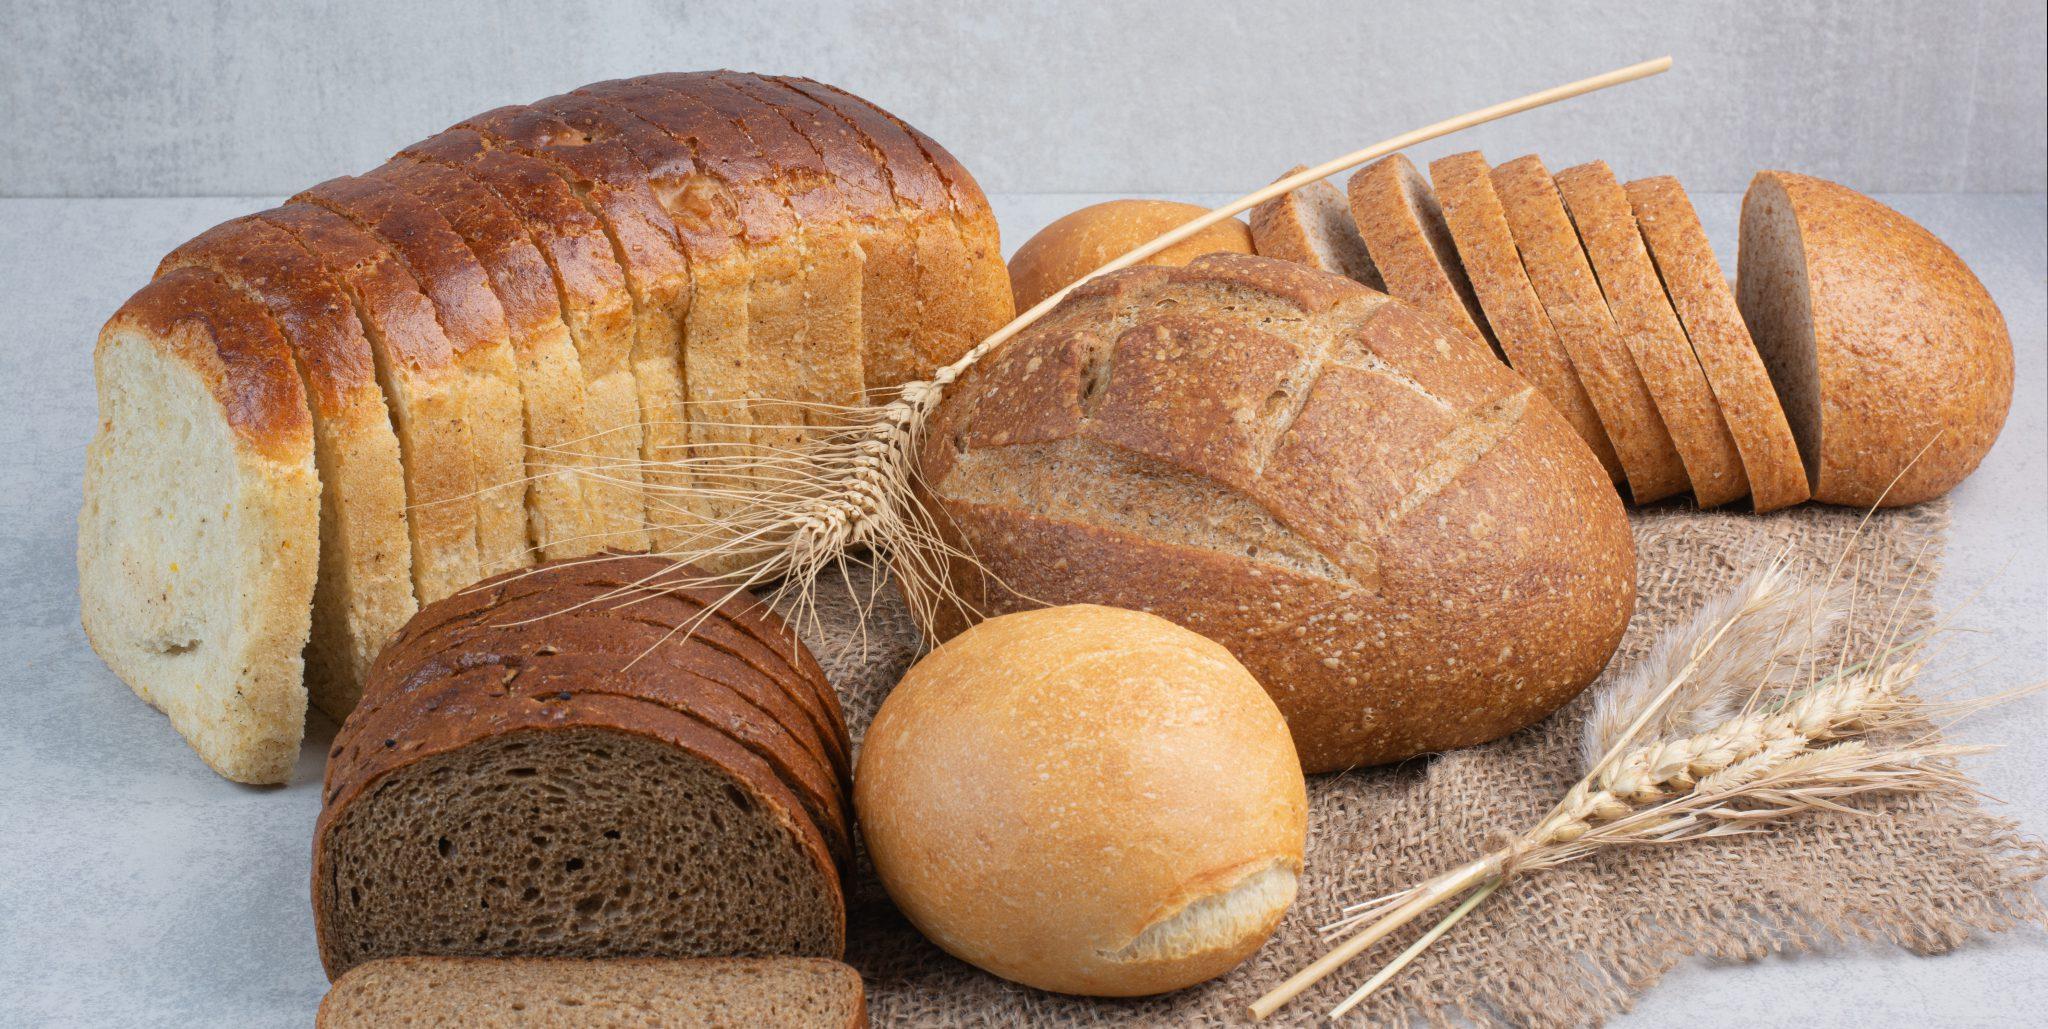 Uživanje rafiniranih žitaric zveča tveganje za srčni napad